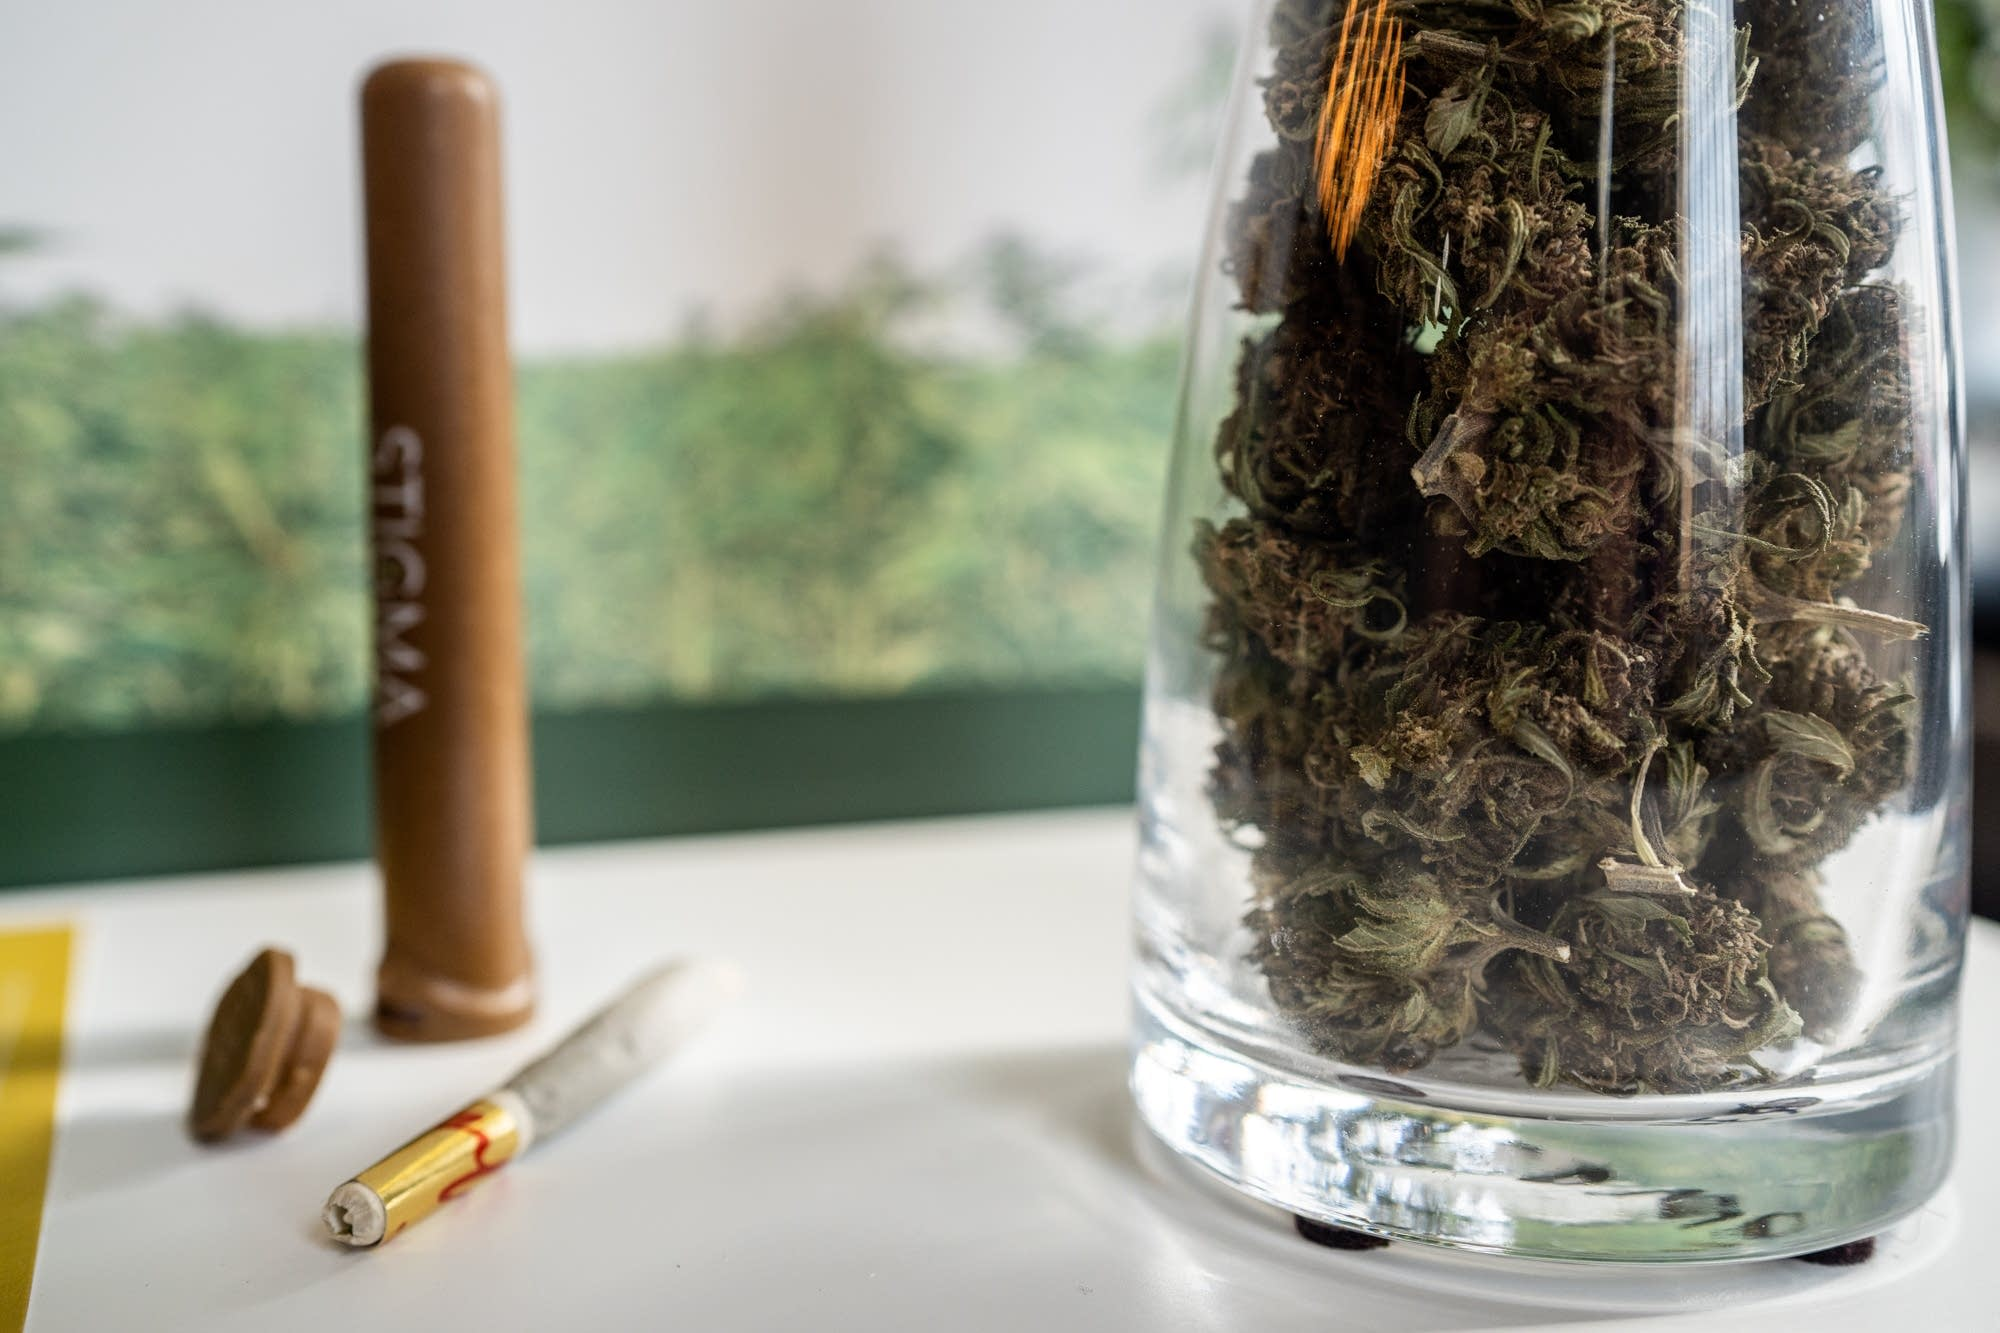 A jar of hemp sits next to a 1-gram